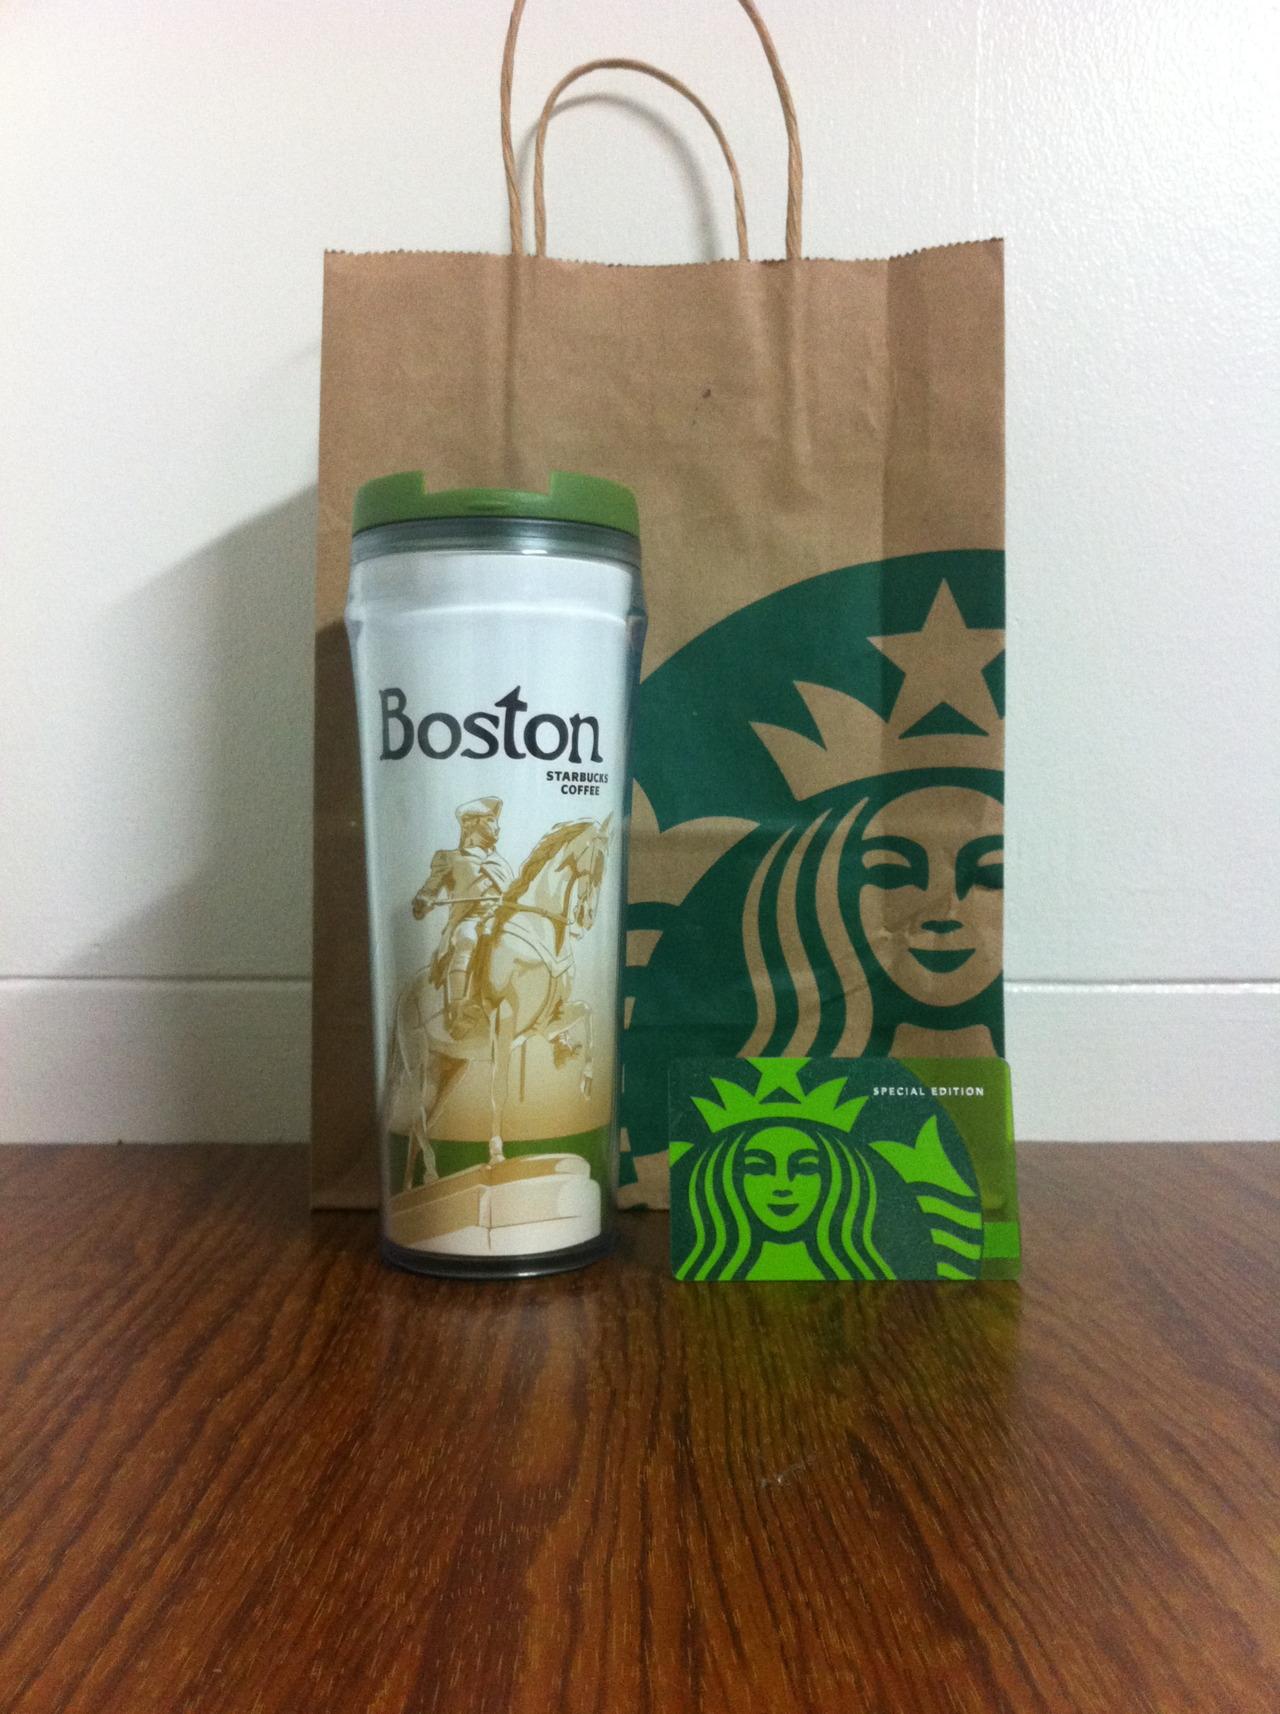 boston tumbler Image Result For Image Result For Starbuck Tumblers